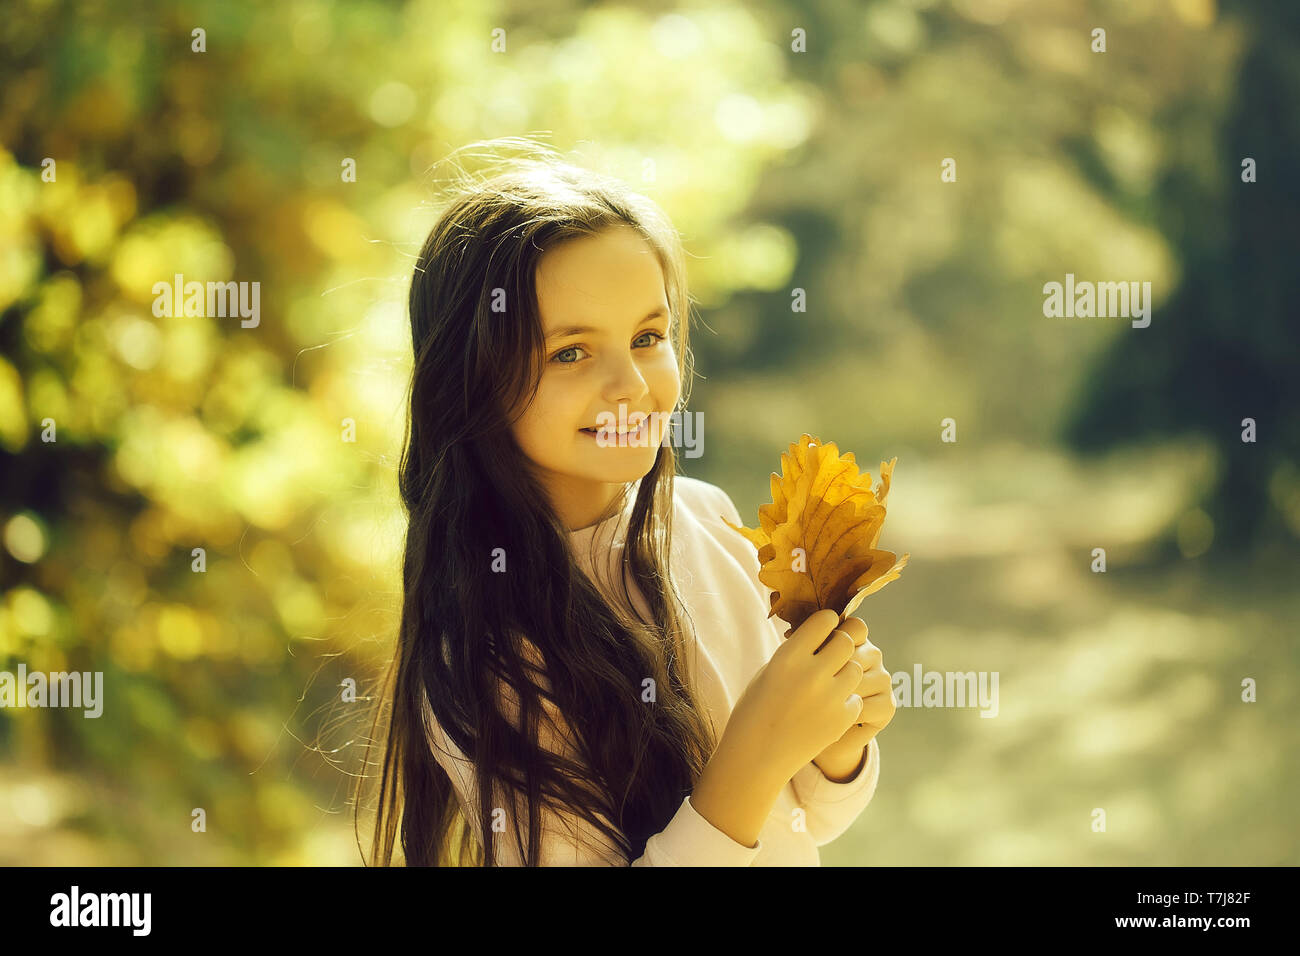 Cute school age girl - Stock Image